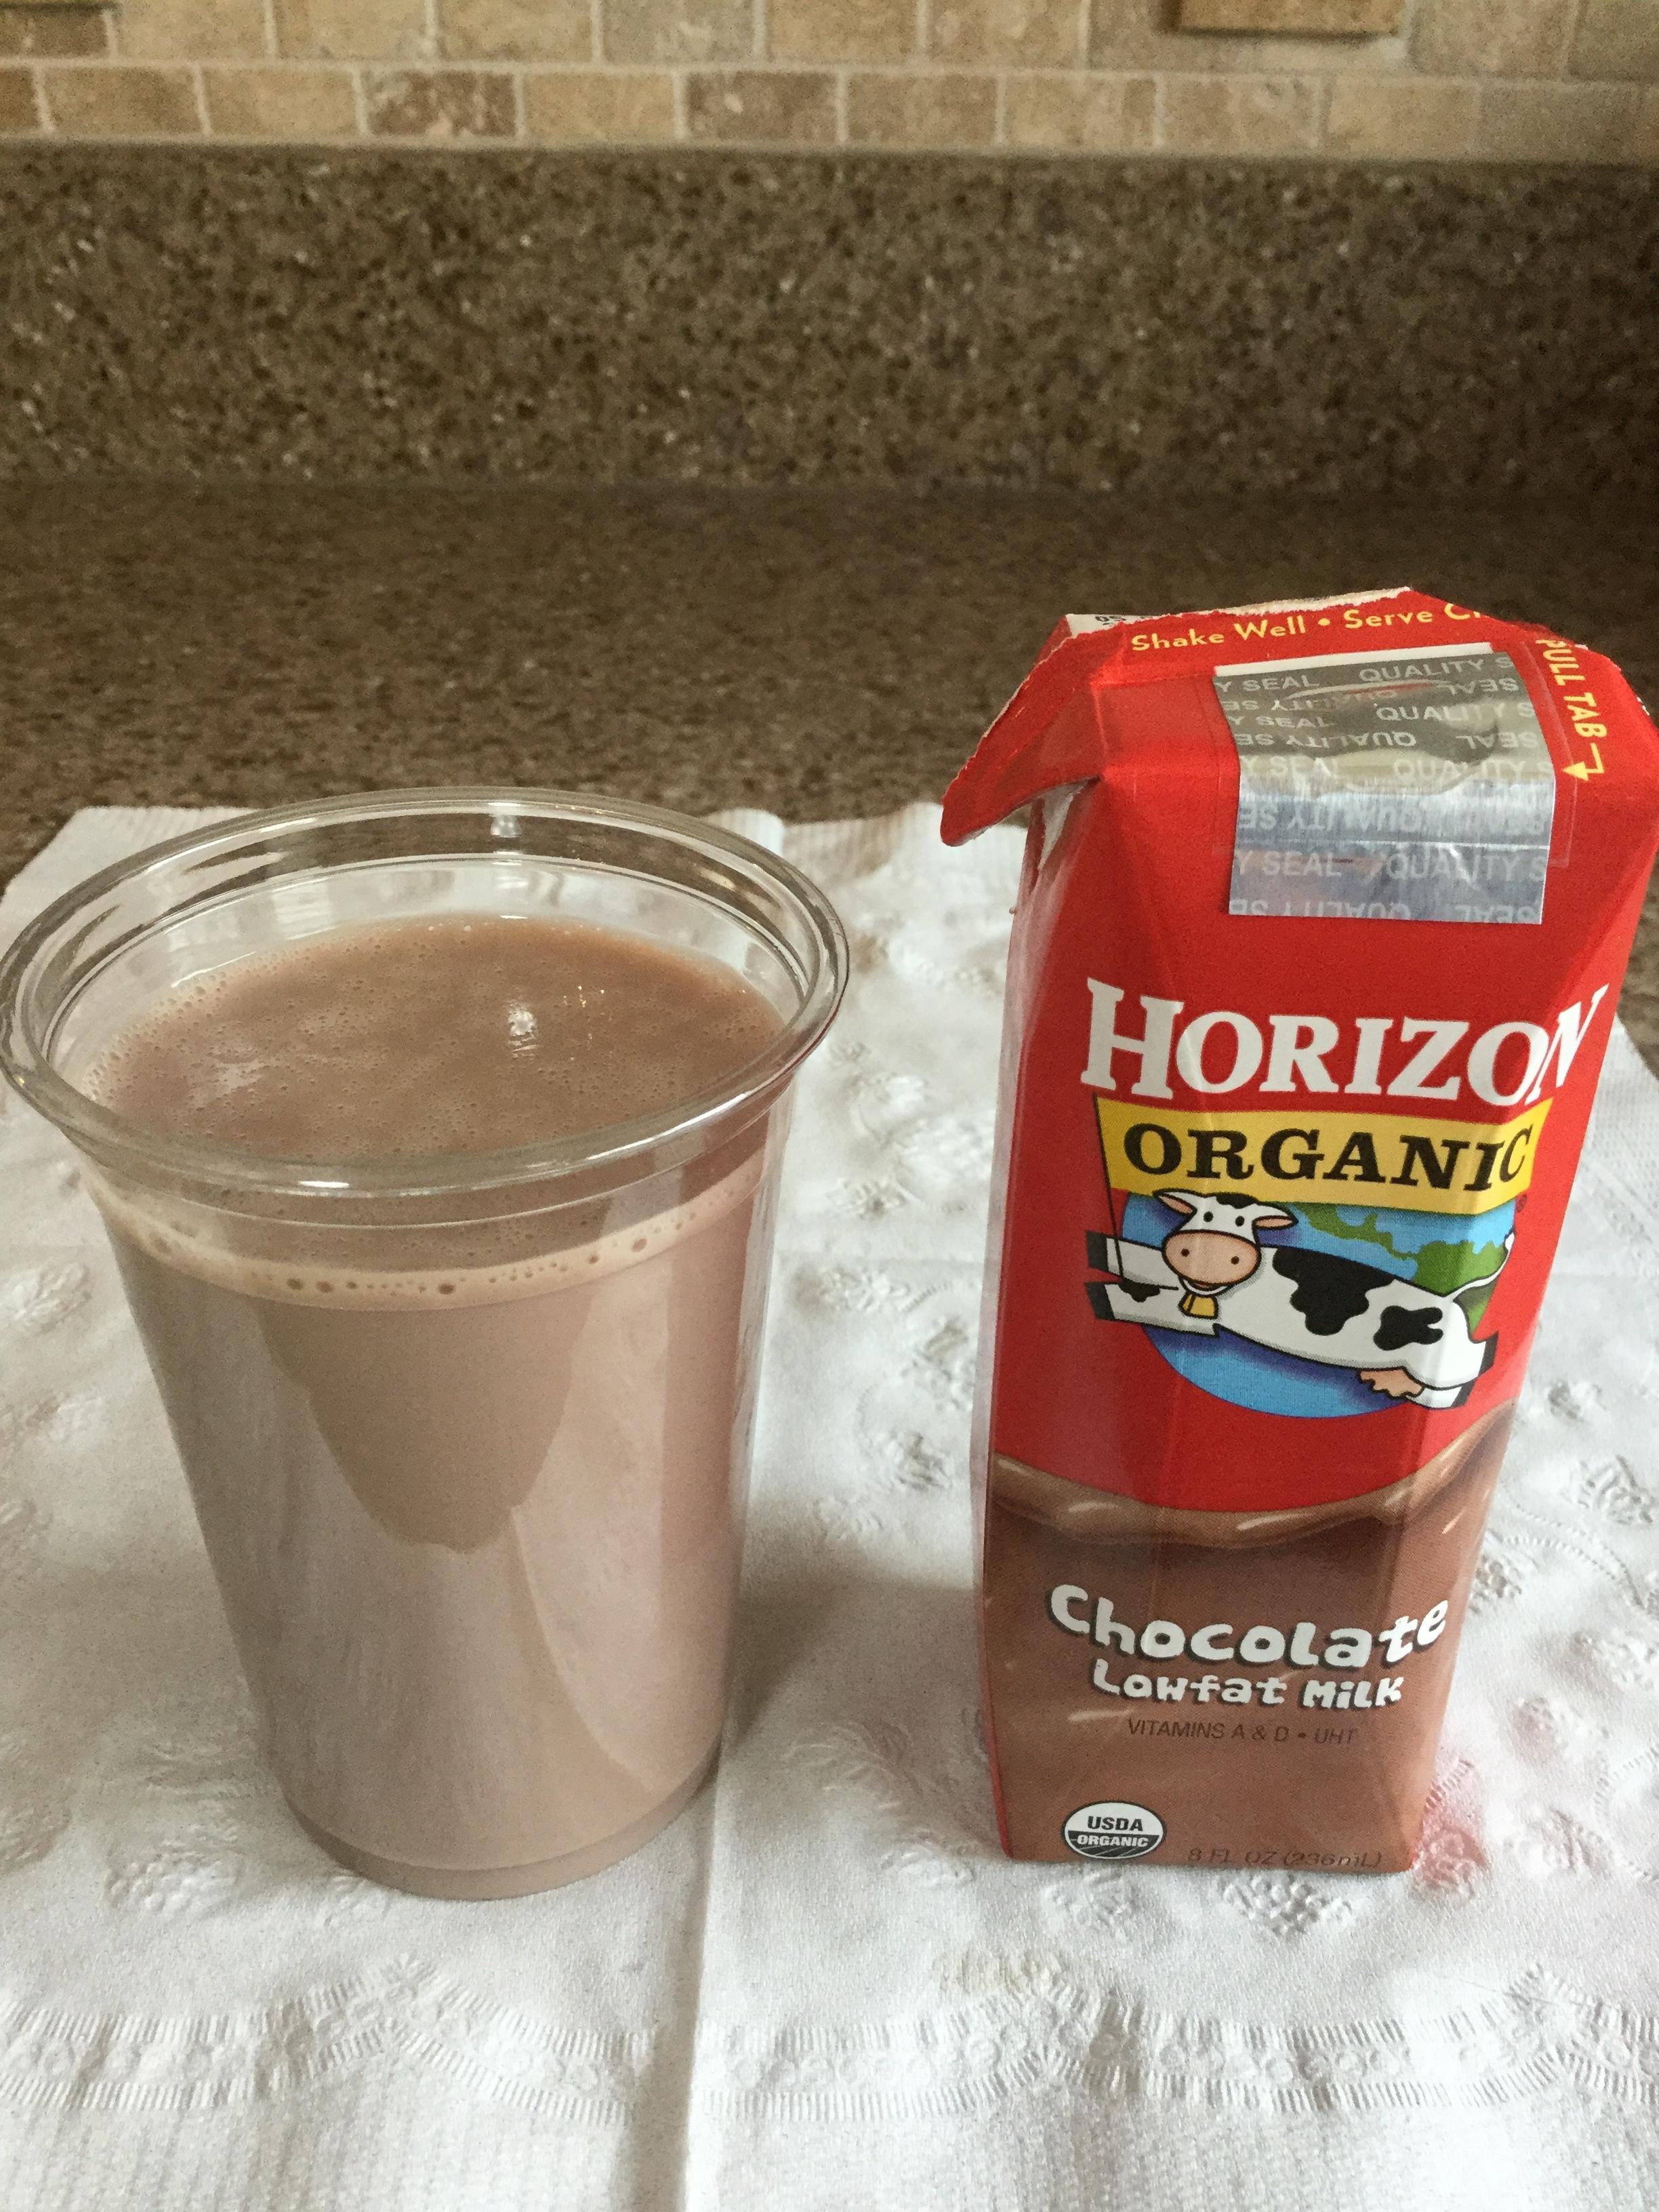 Horizon Organic Chocolate Lowfat Milk (UHT) Cup